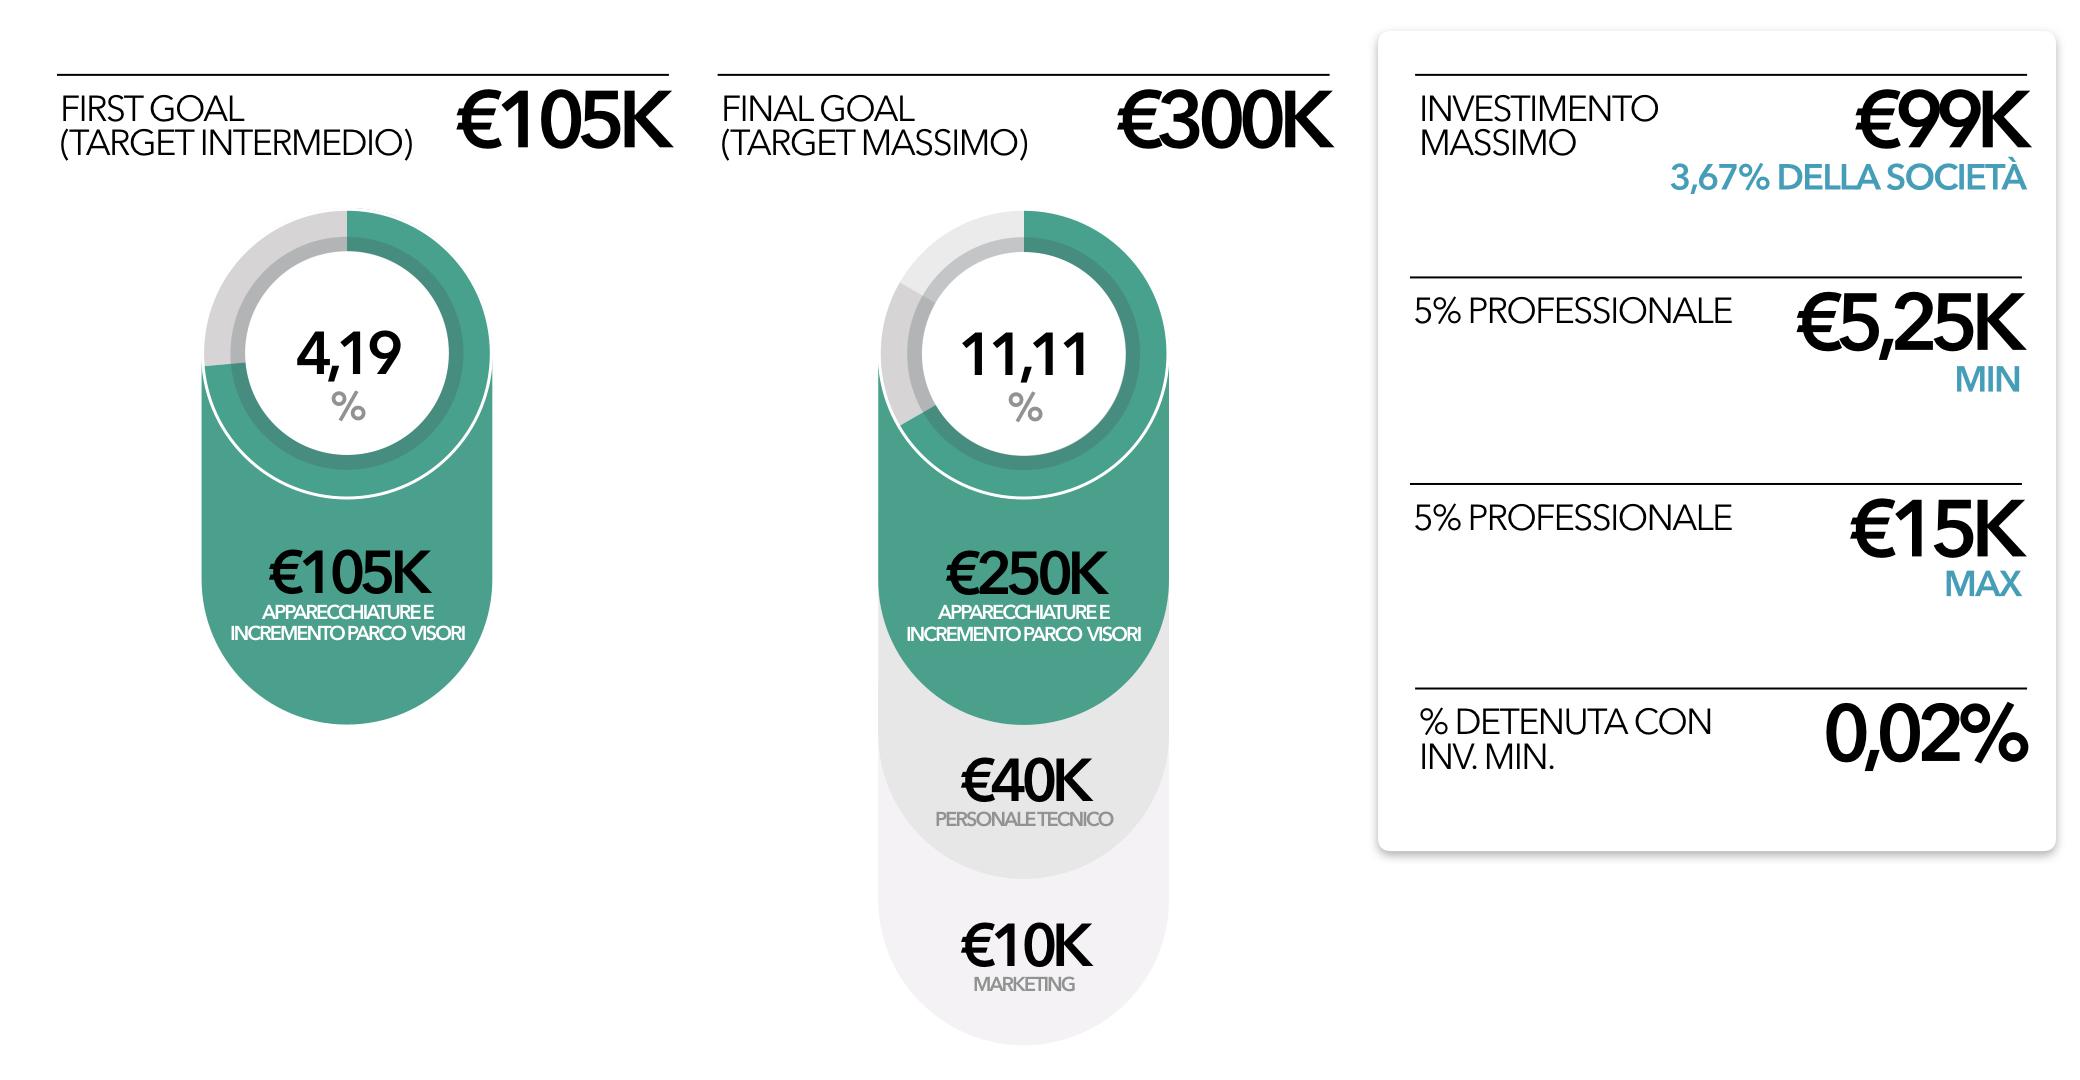 terra-aqua-crowdfunding-struttura-offerta